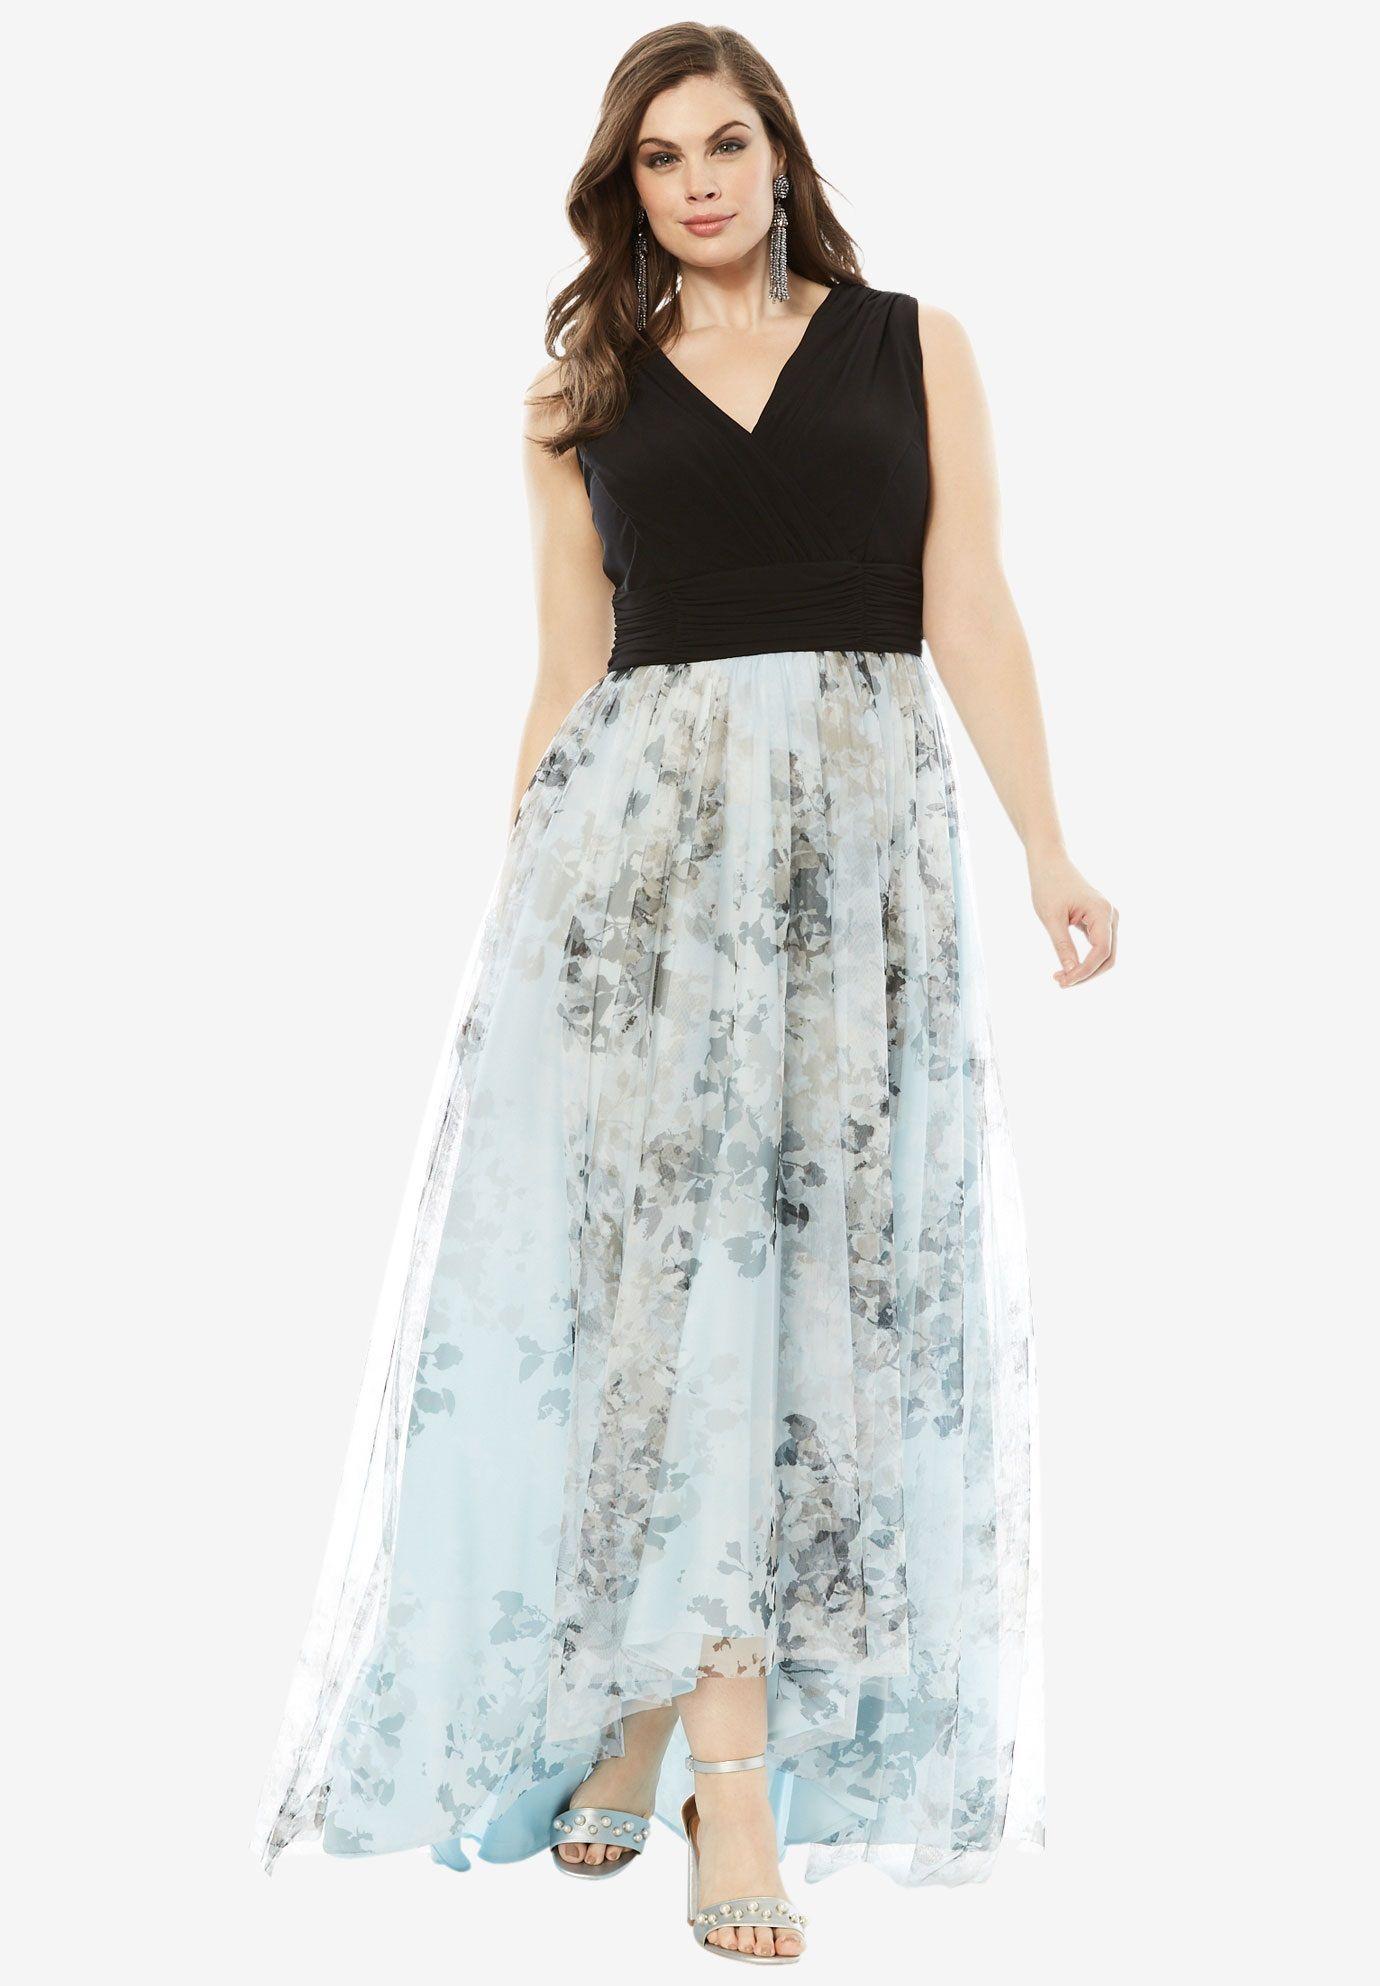 9edb9c4556bea Printed High Low Dress, BLUE FLORAL PRINT, hi-res | Wedding attire ...